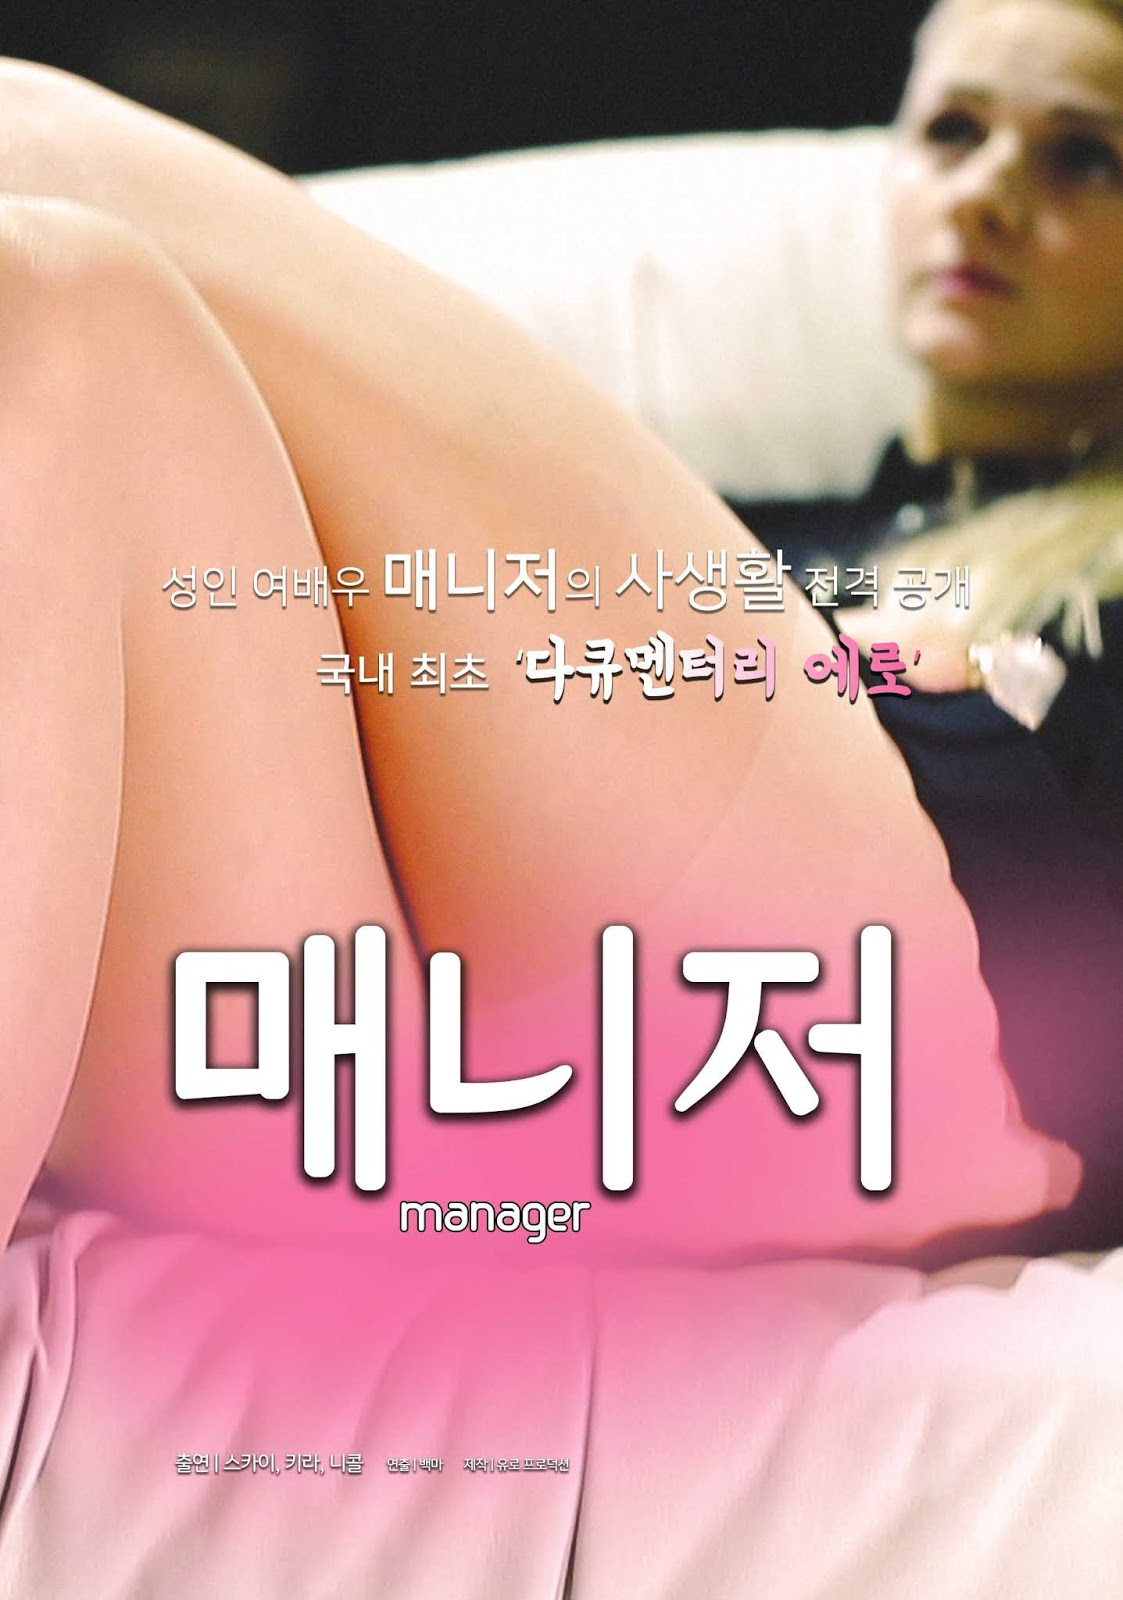 Manager Full Korea 18+ Adult Movie Online Free